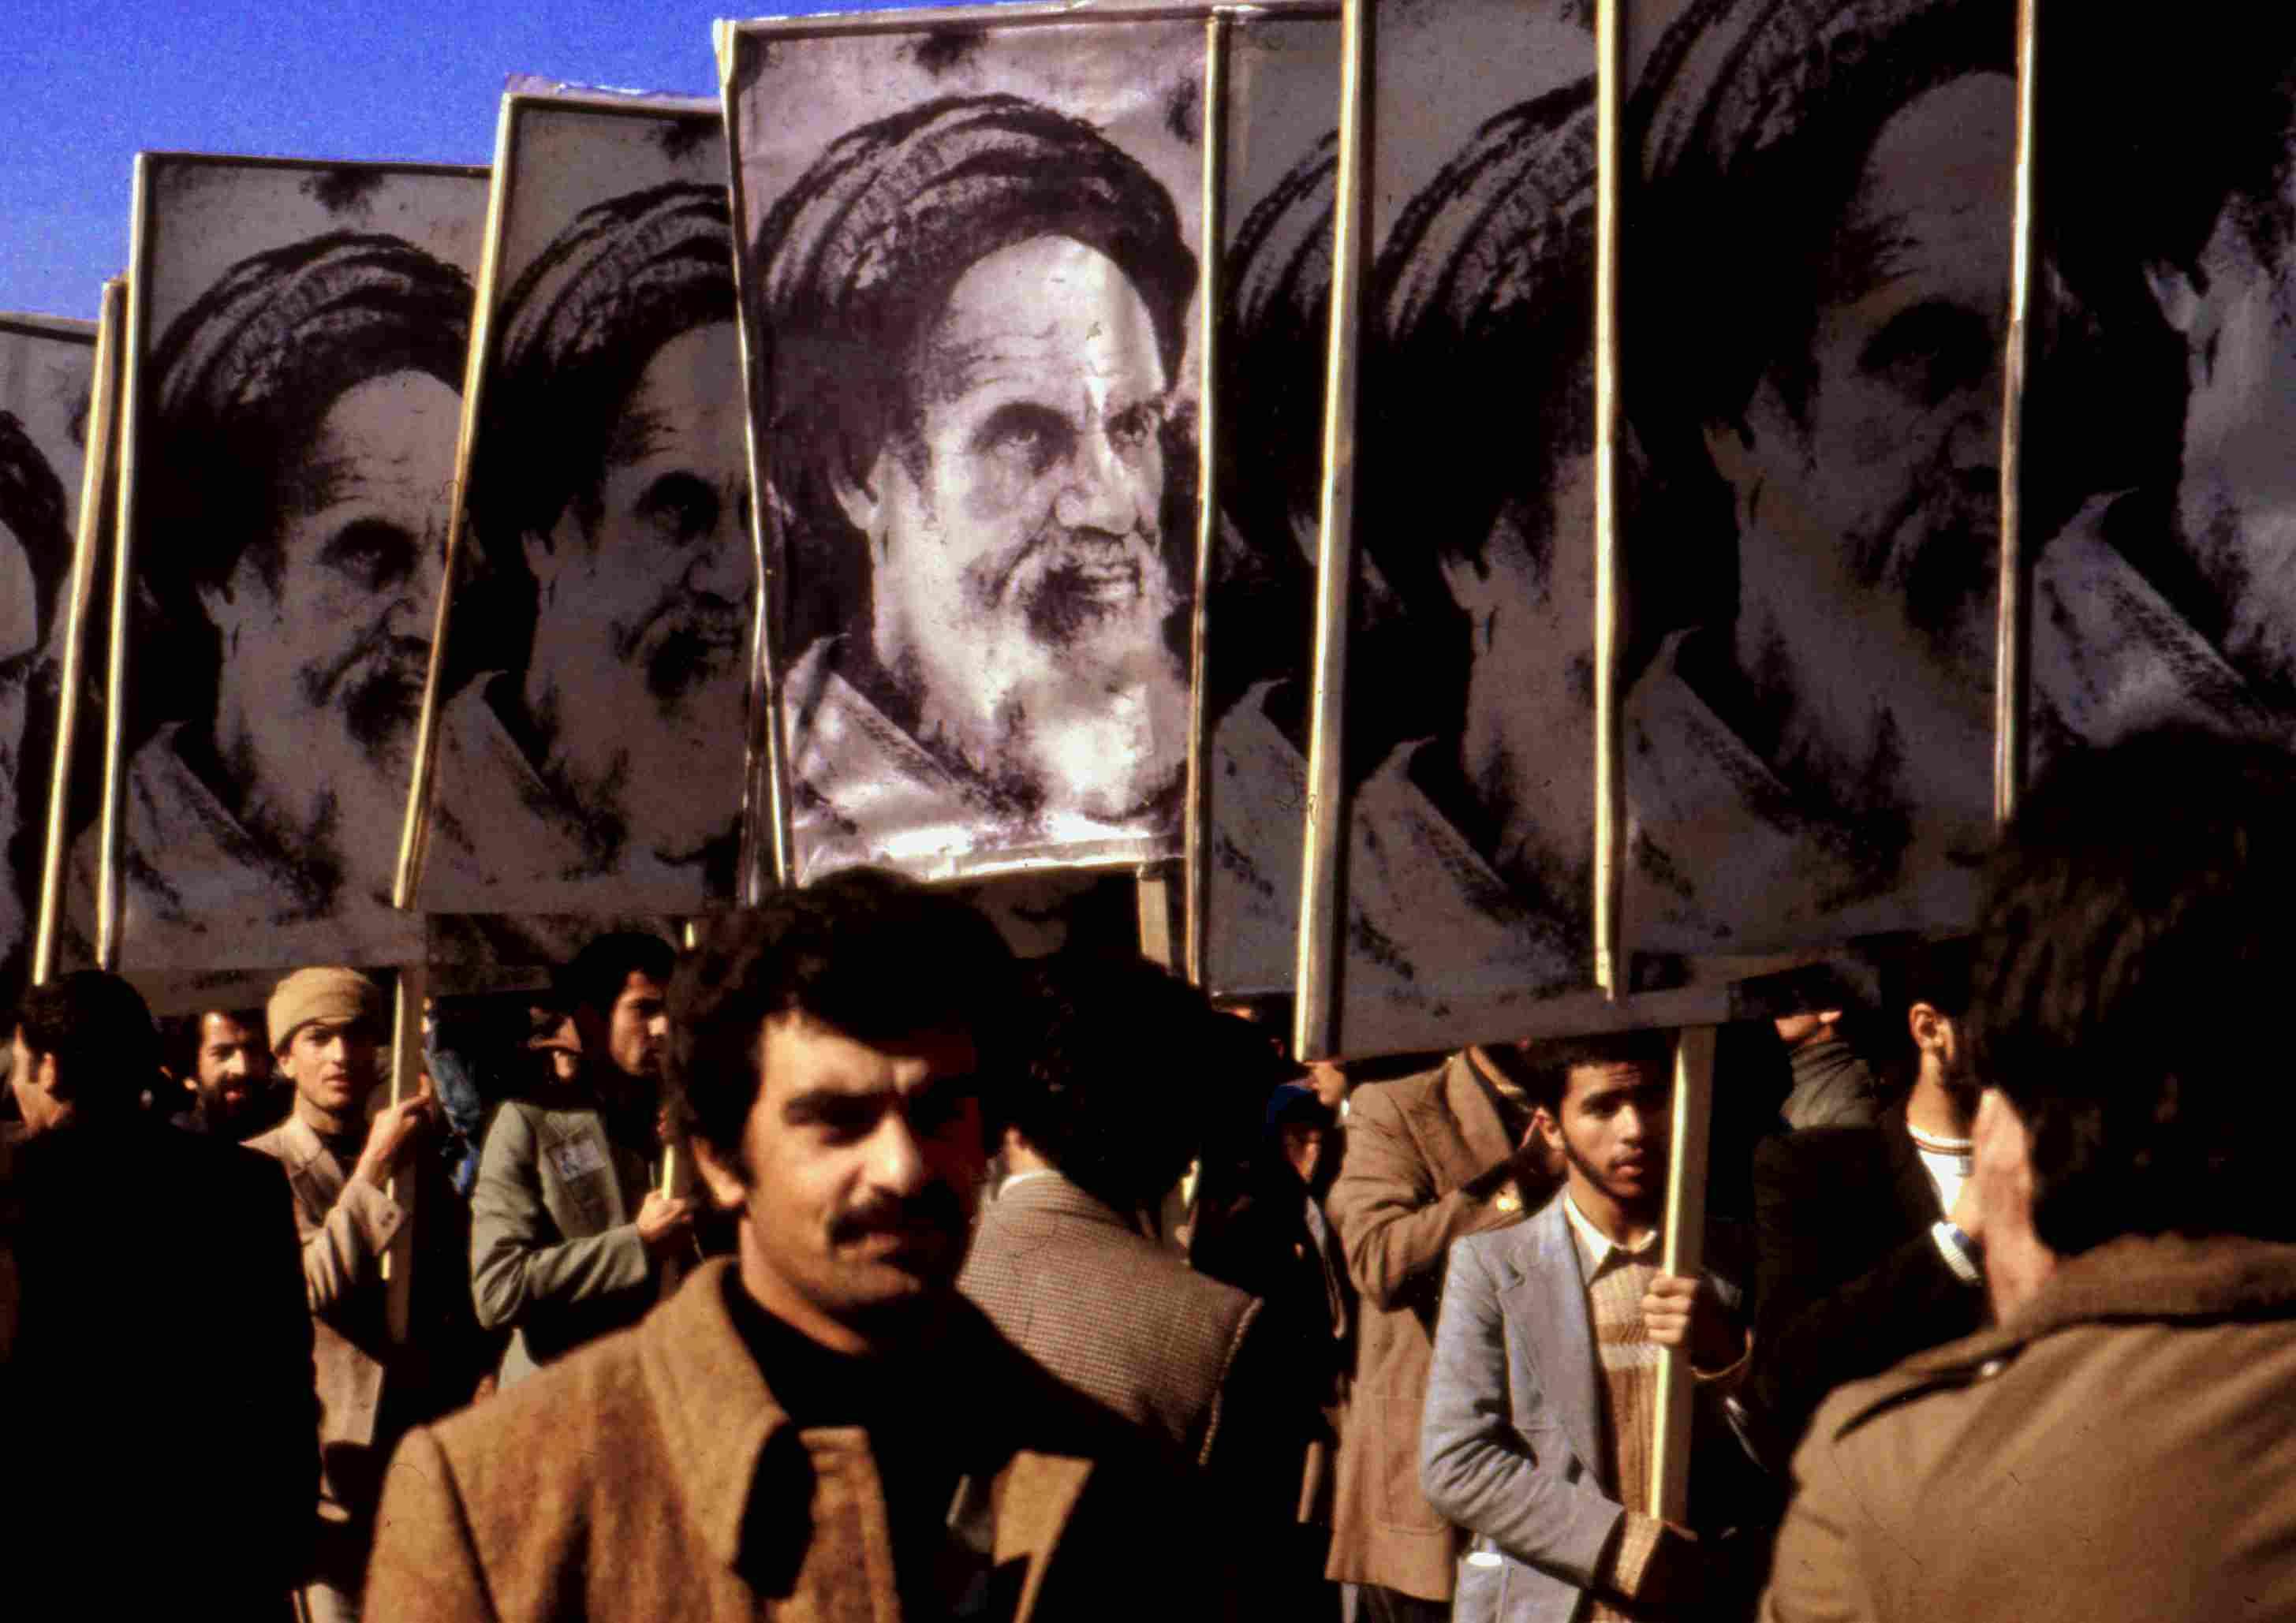 Public Demostration against the Shah